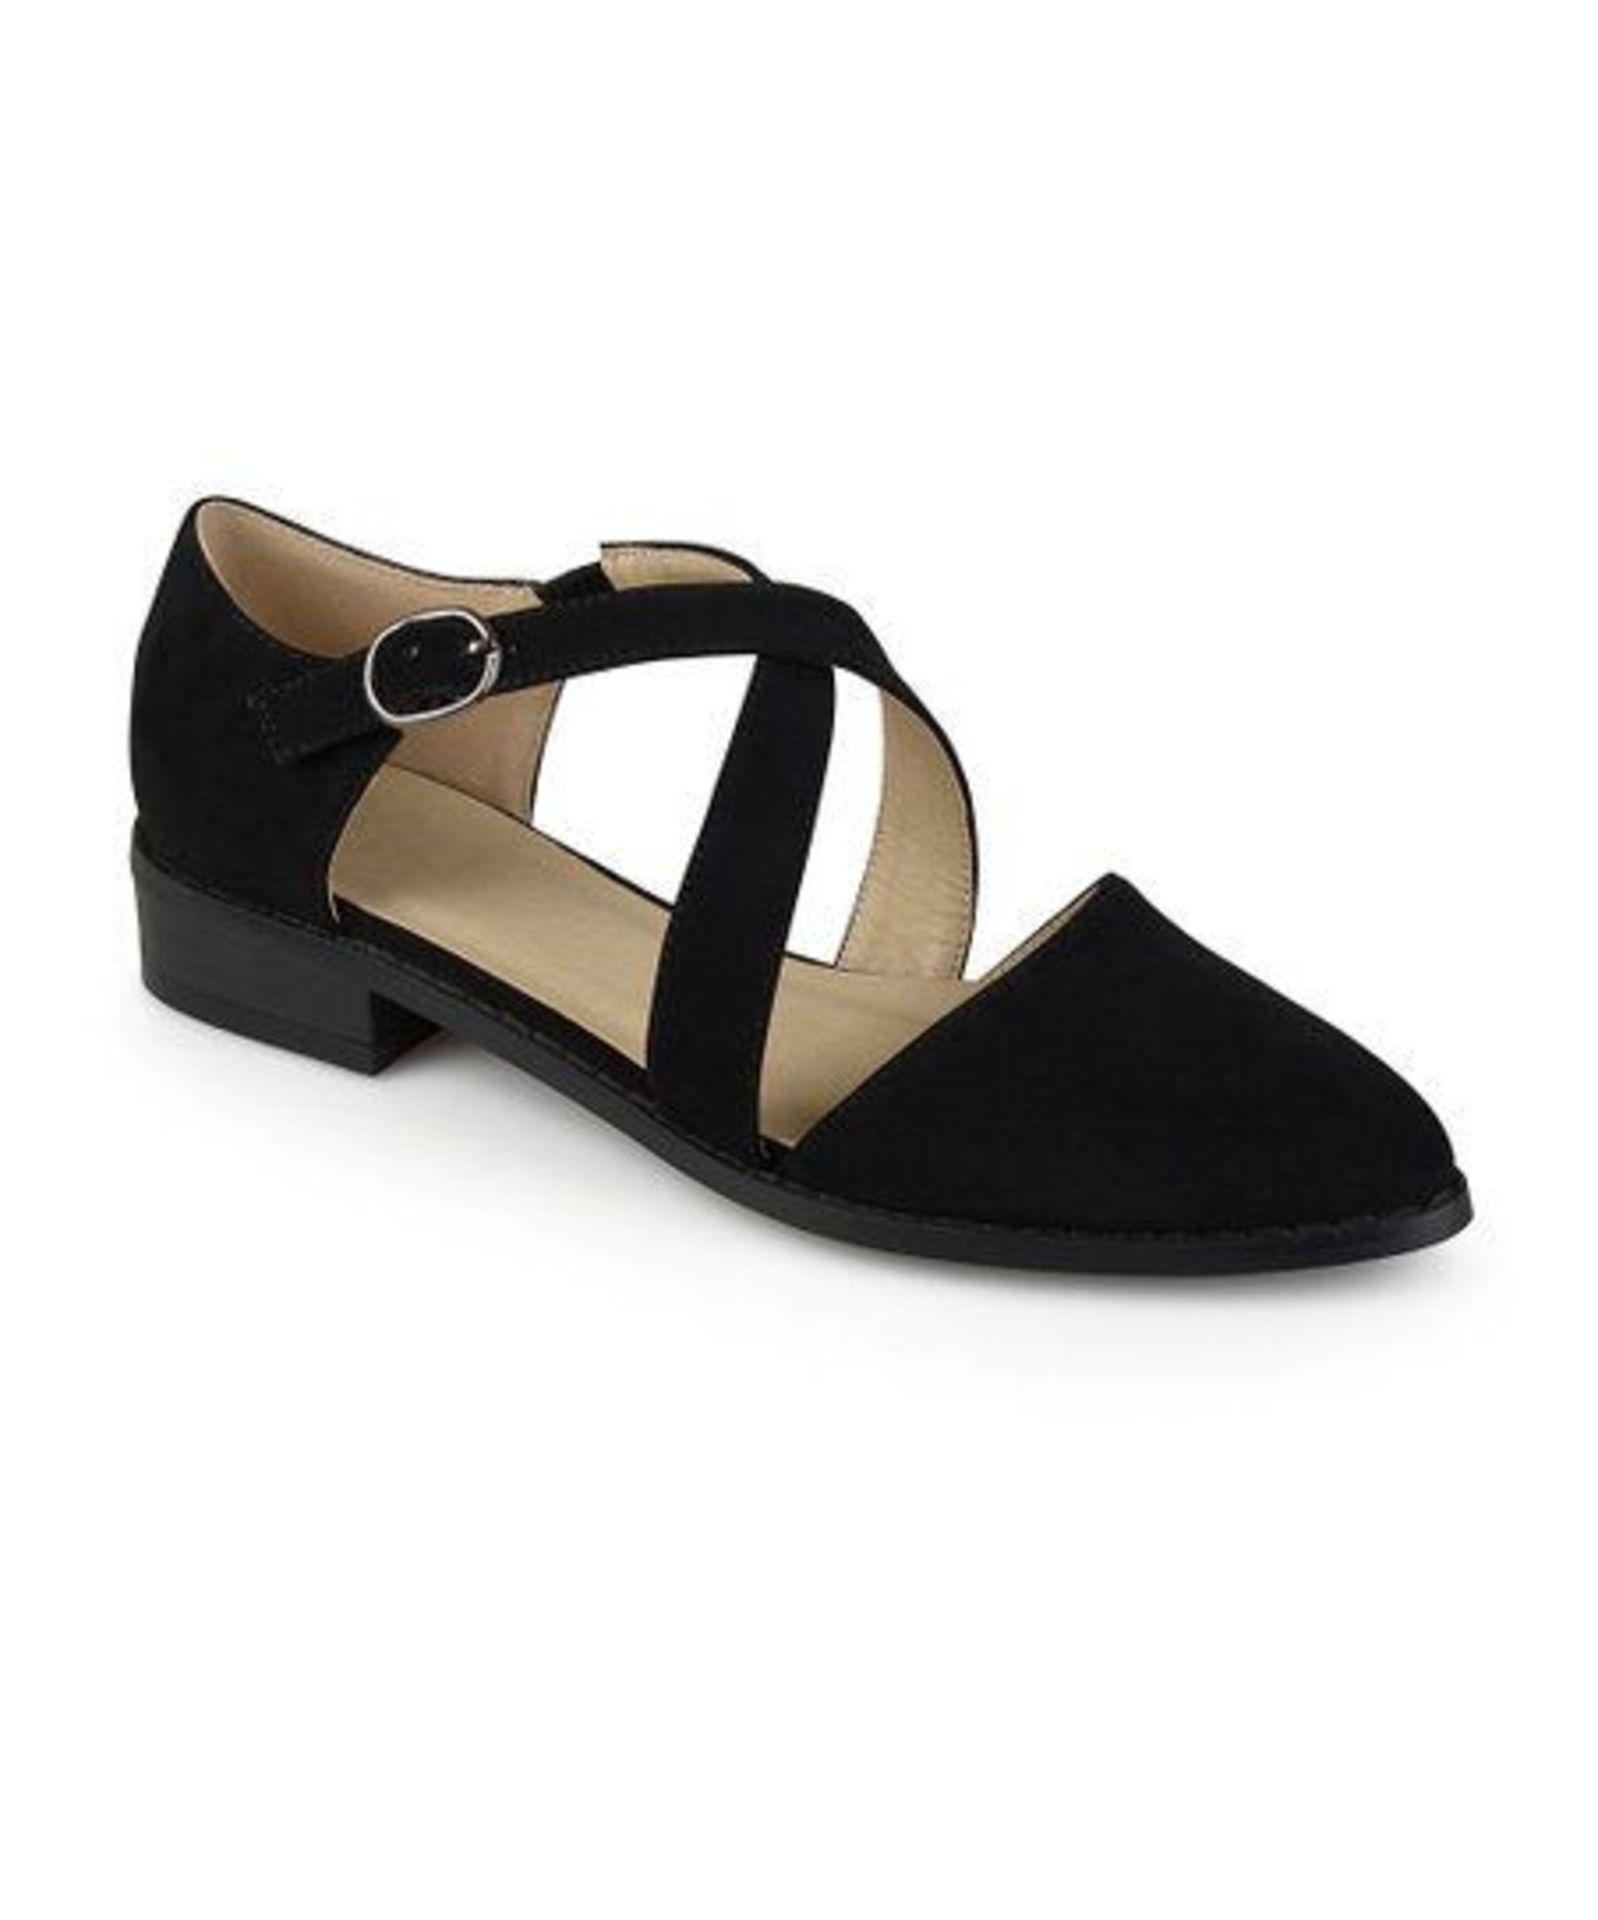 Lot 53 - Bella Cora Black Elina Flat (Uk Size:5/Us Size:7.5) (New With Box) [Ref: 52534225-H-002]